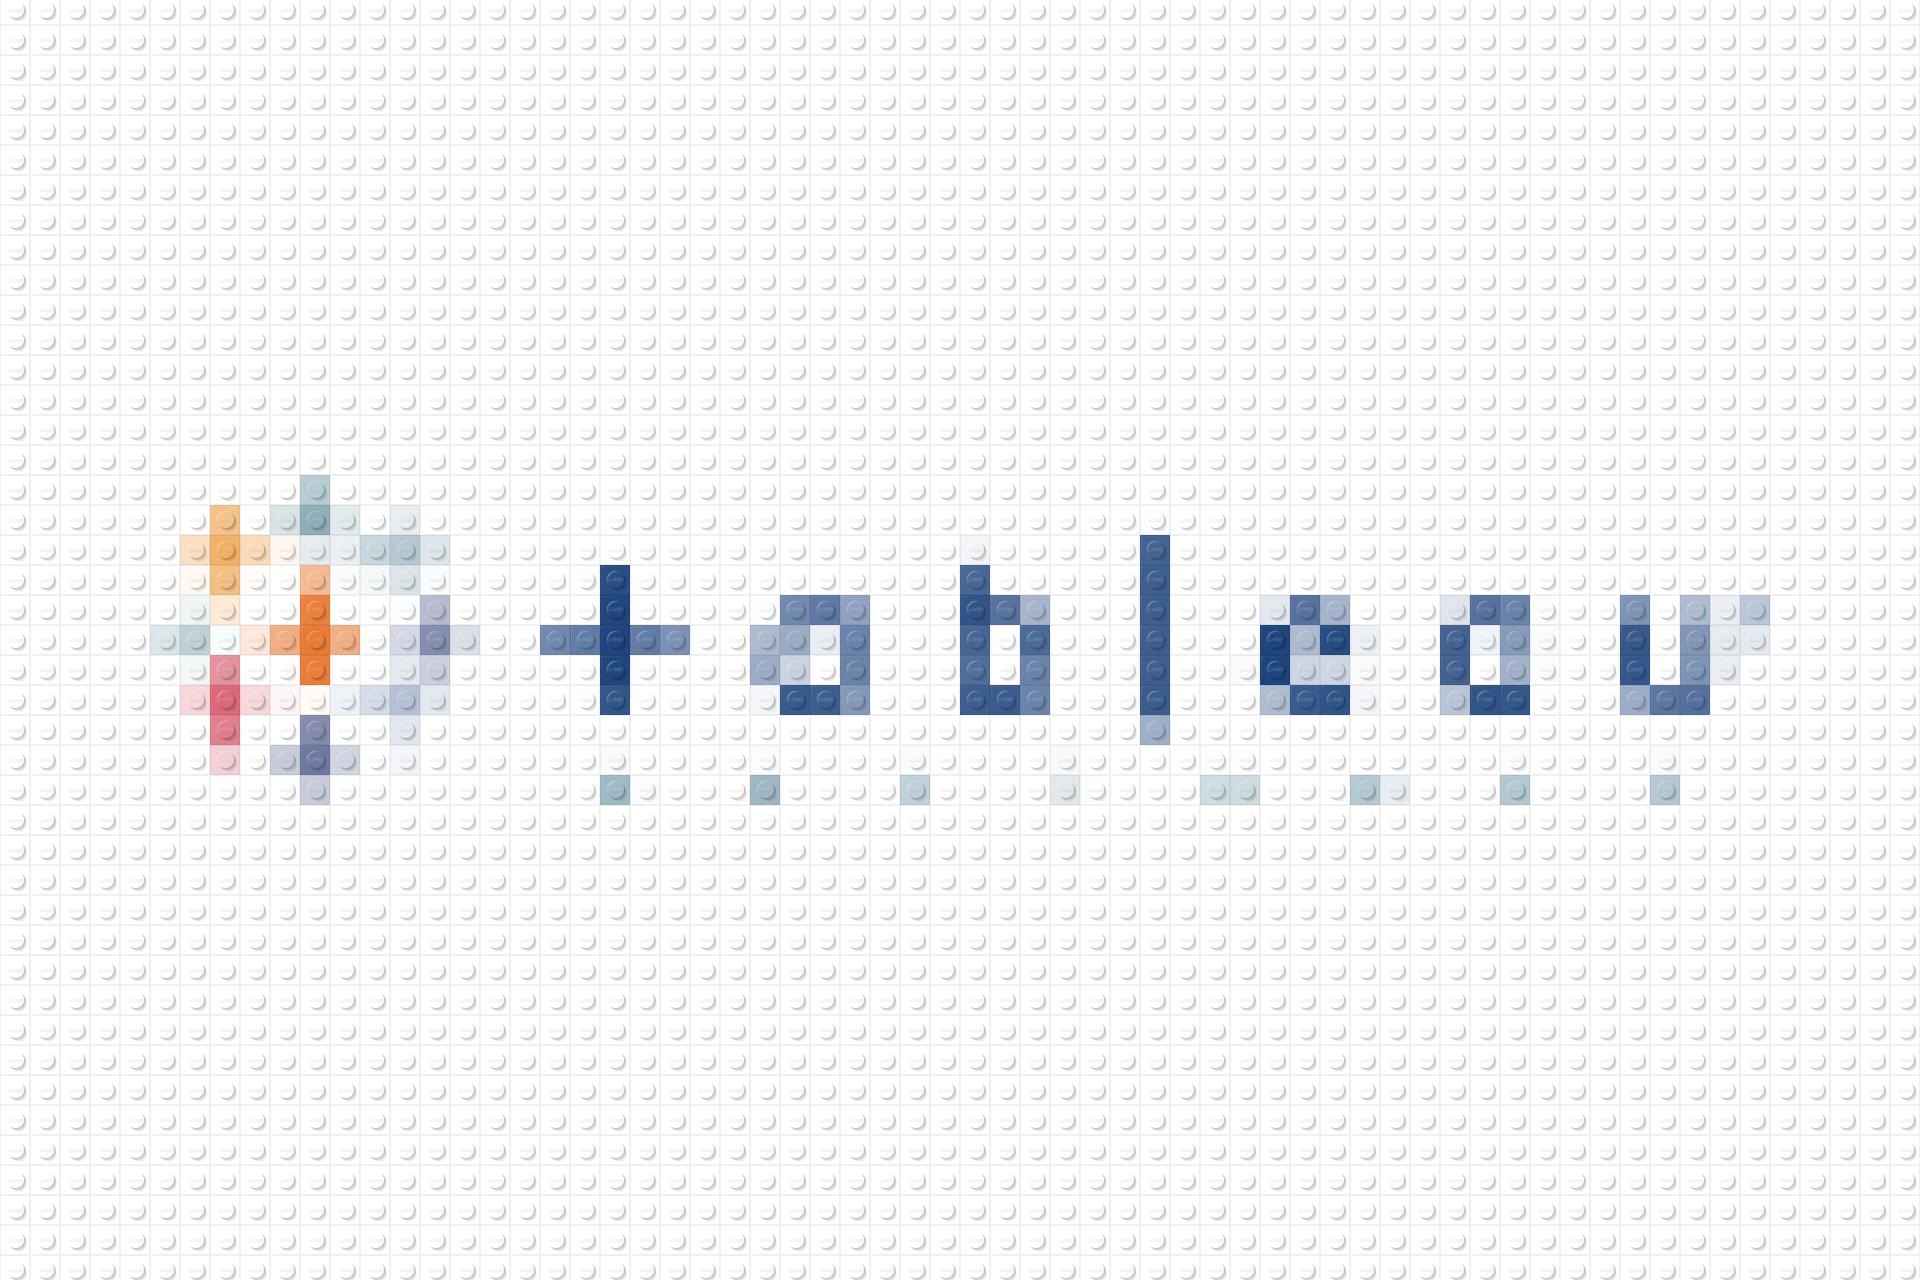 LEGO-ified Tableau logo